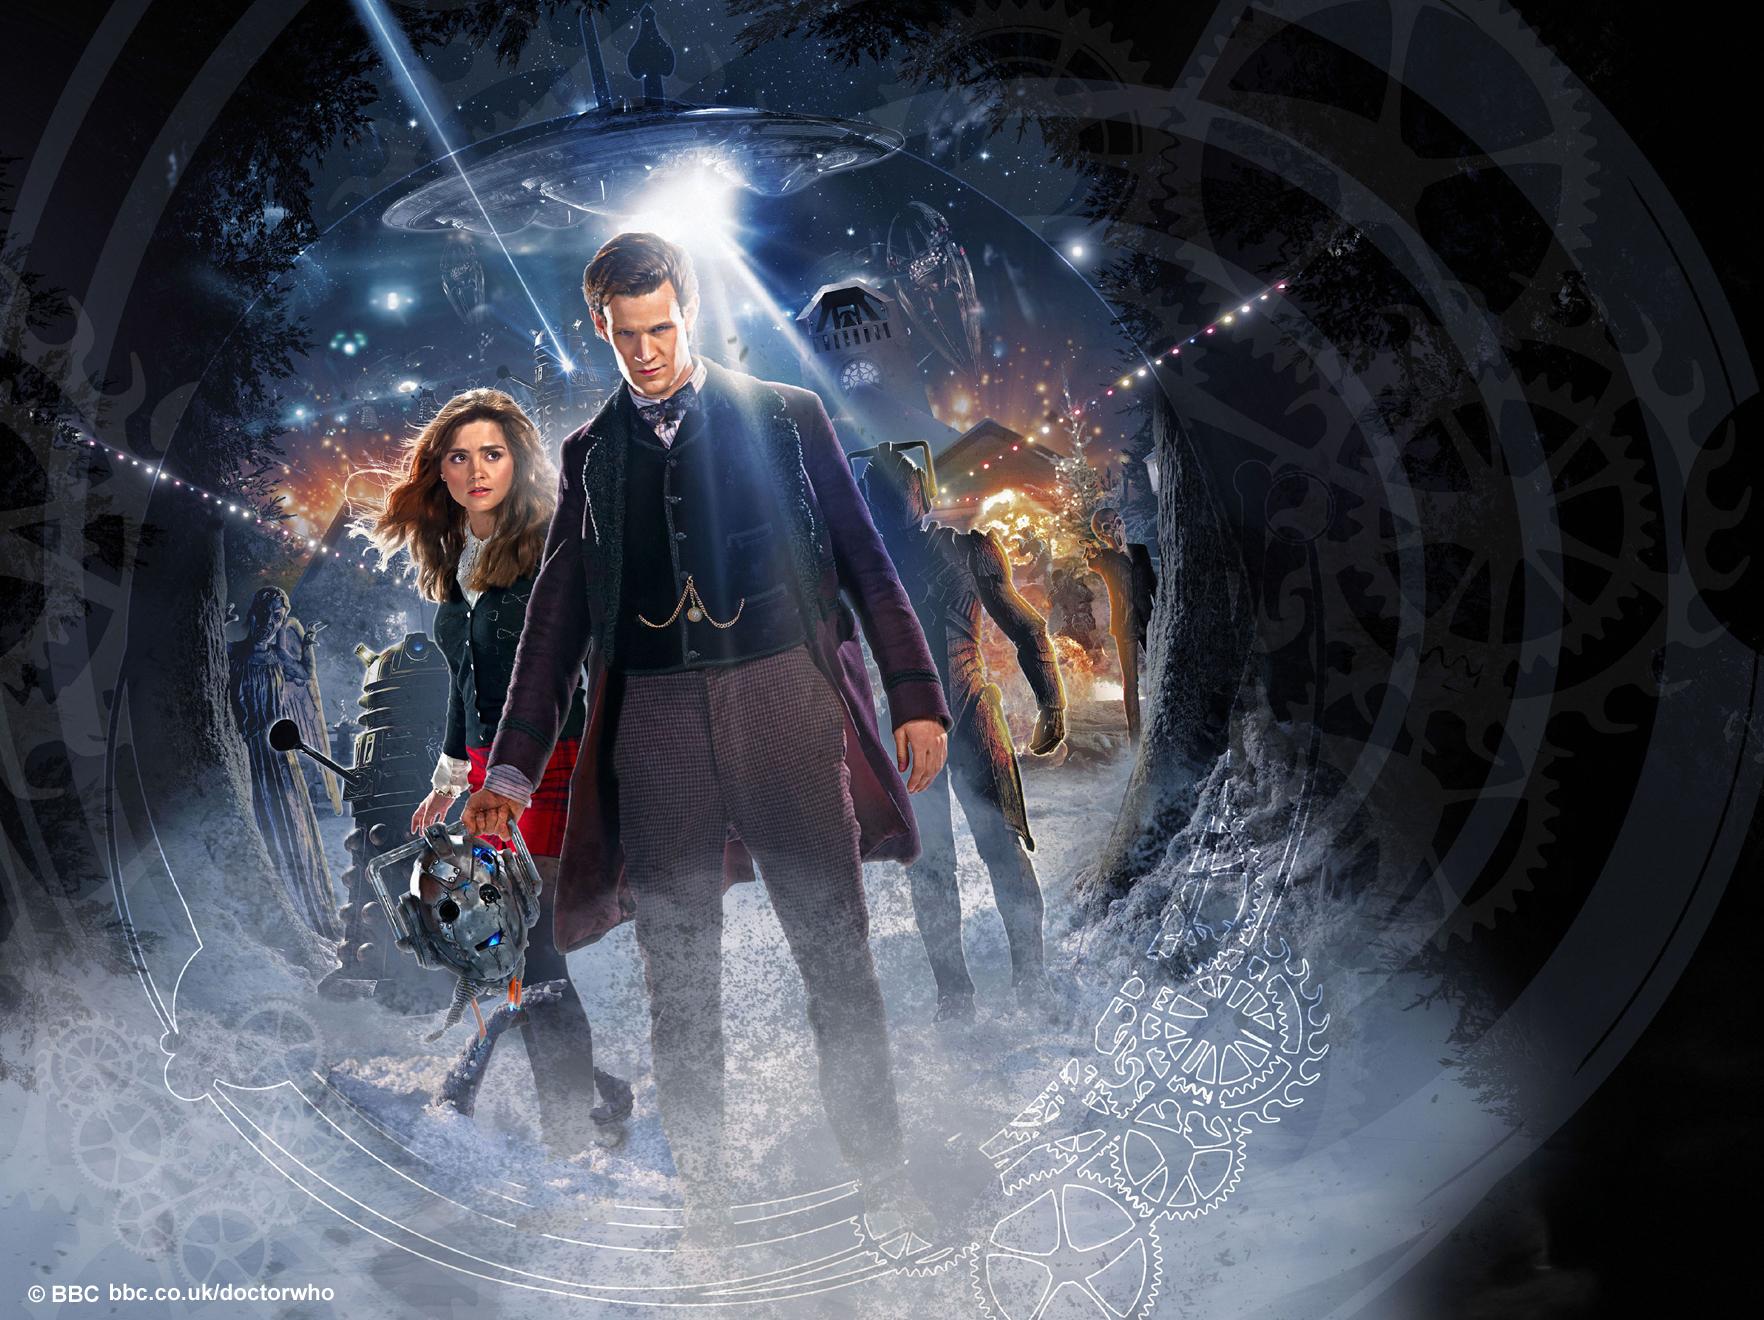 [47+] Doctor Who Live Wallpaper on WallpaperSafari